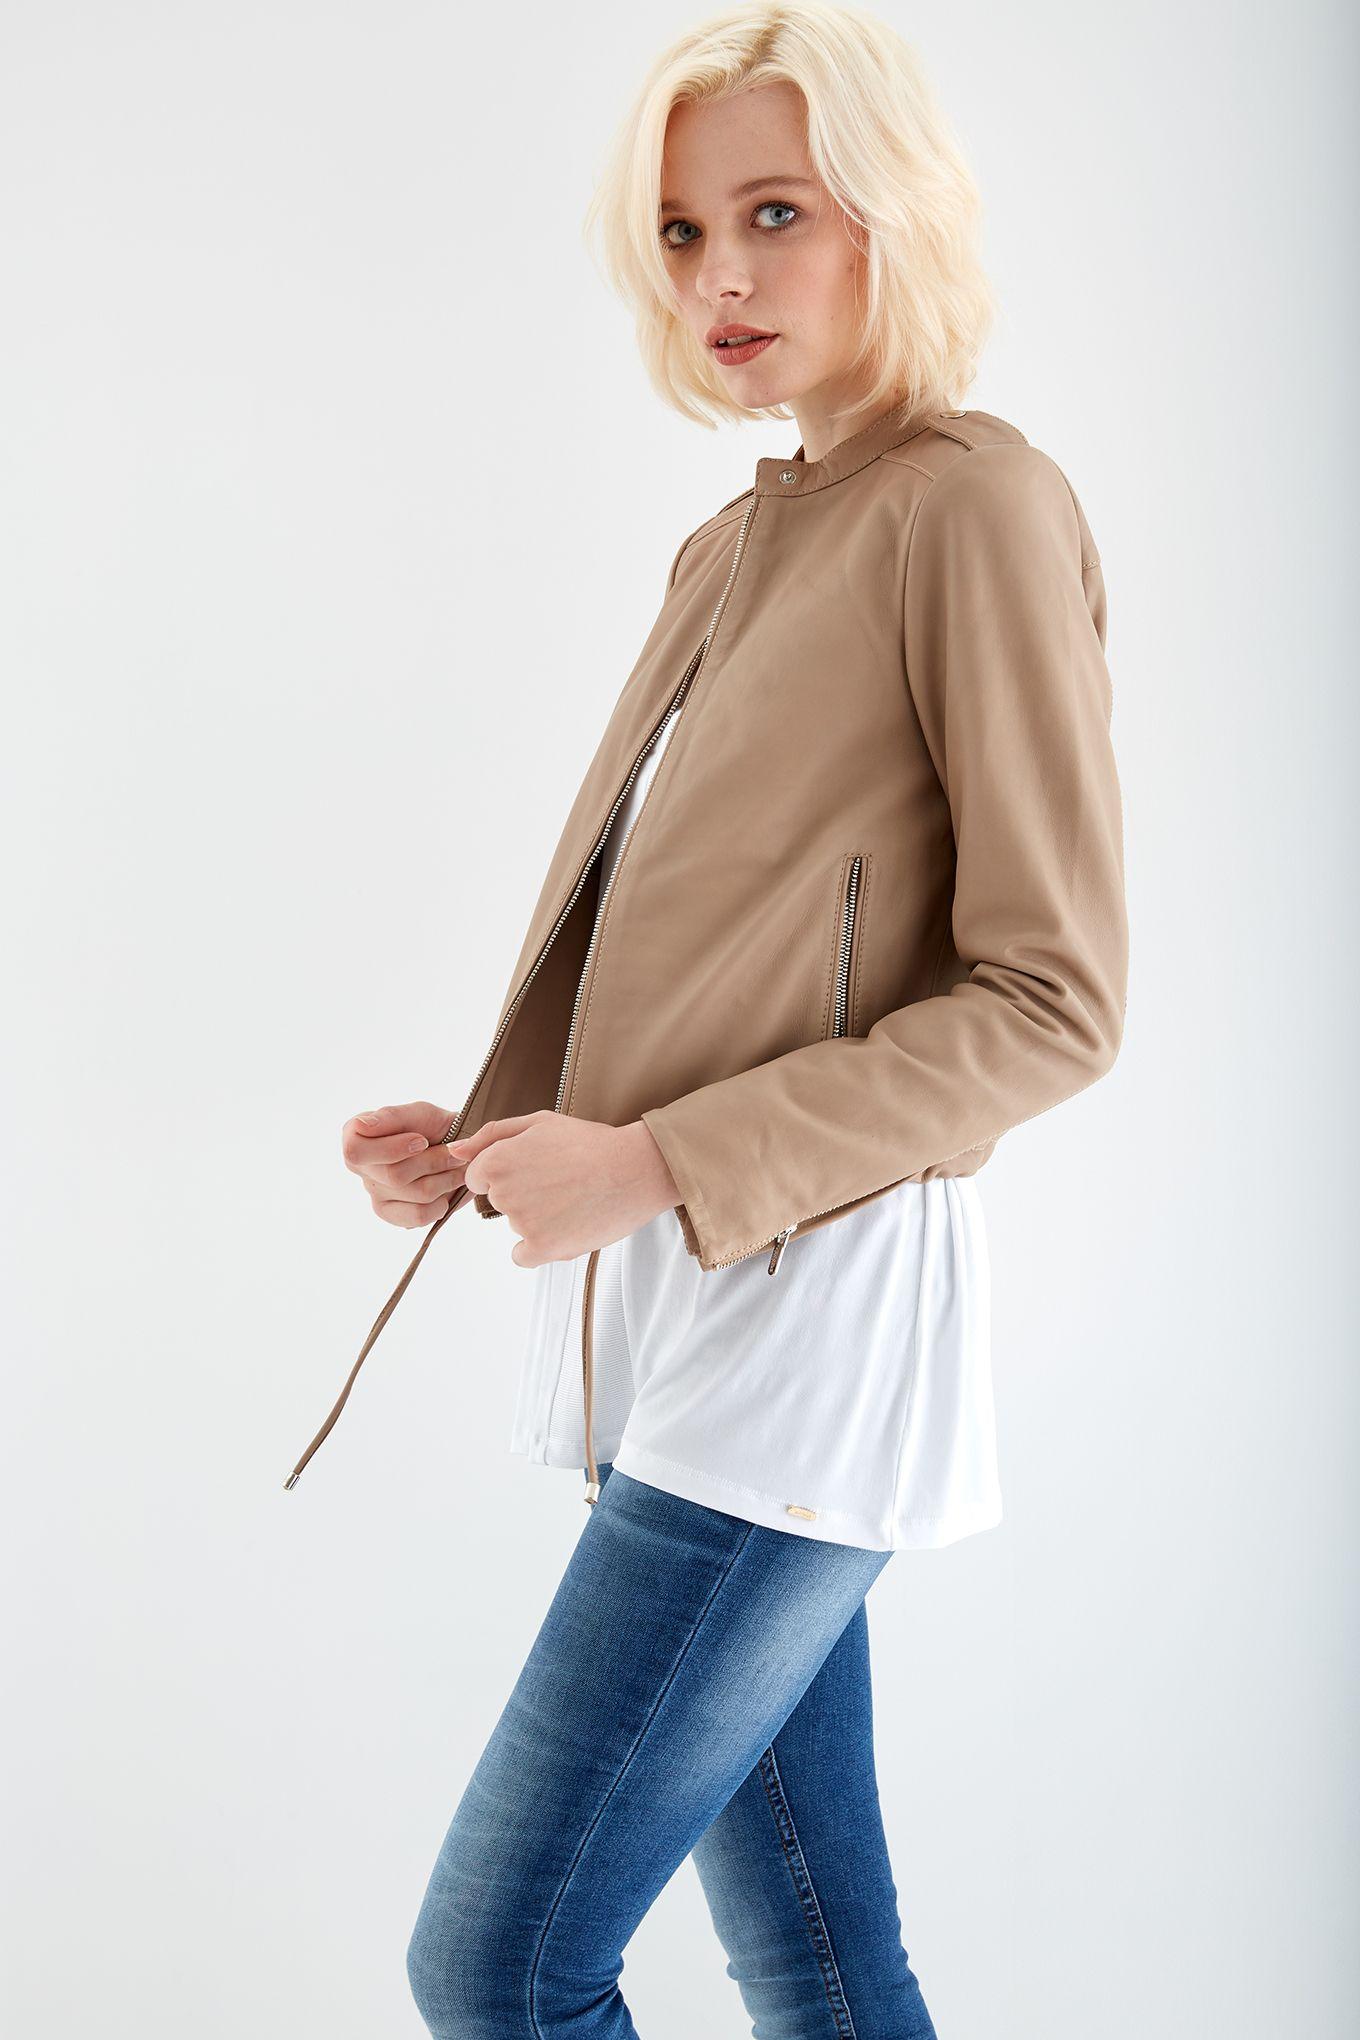 Women s Leather Jacket